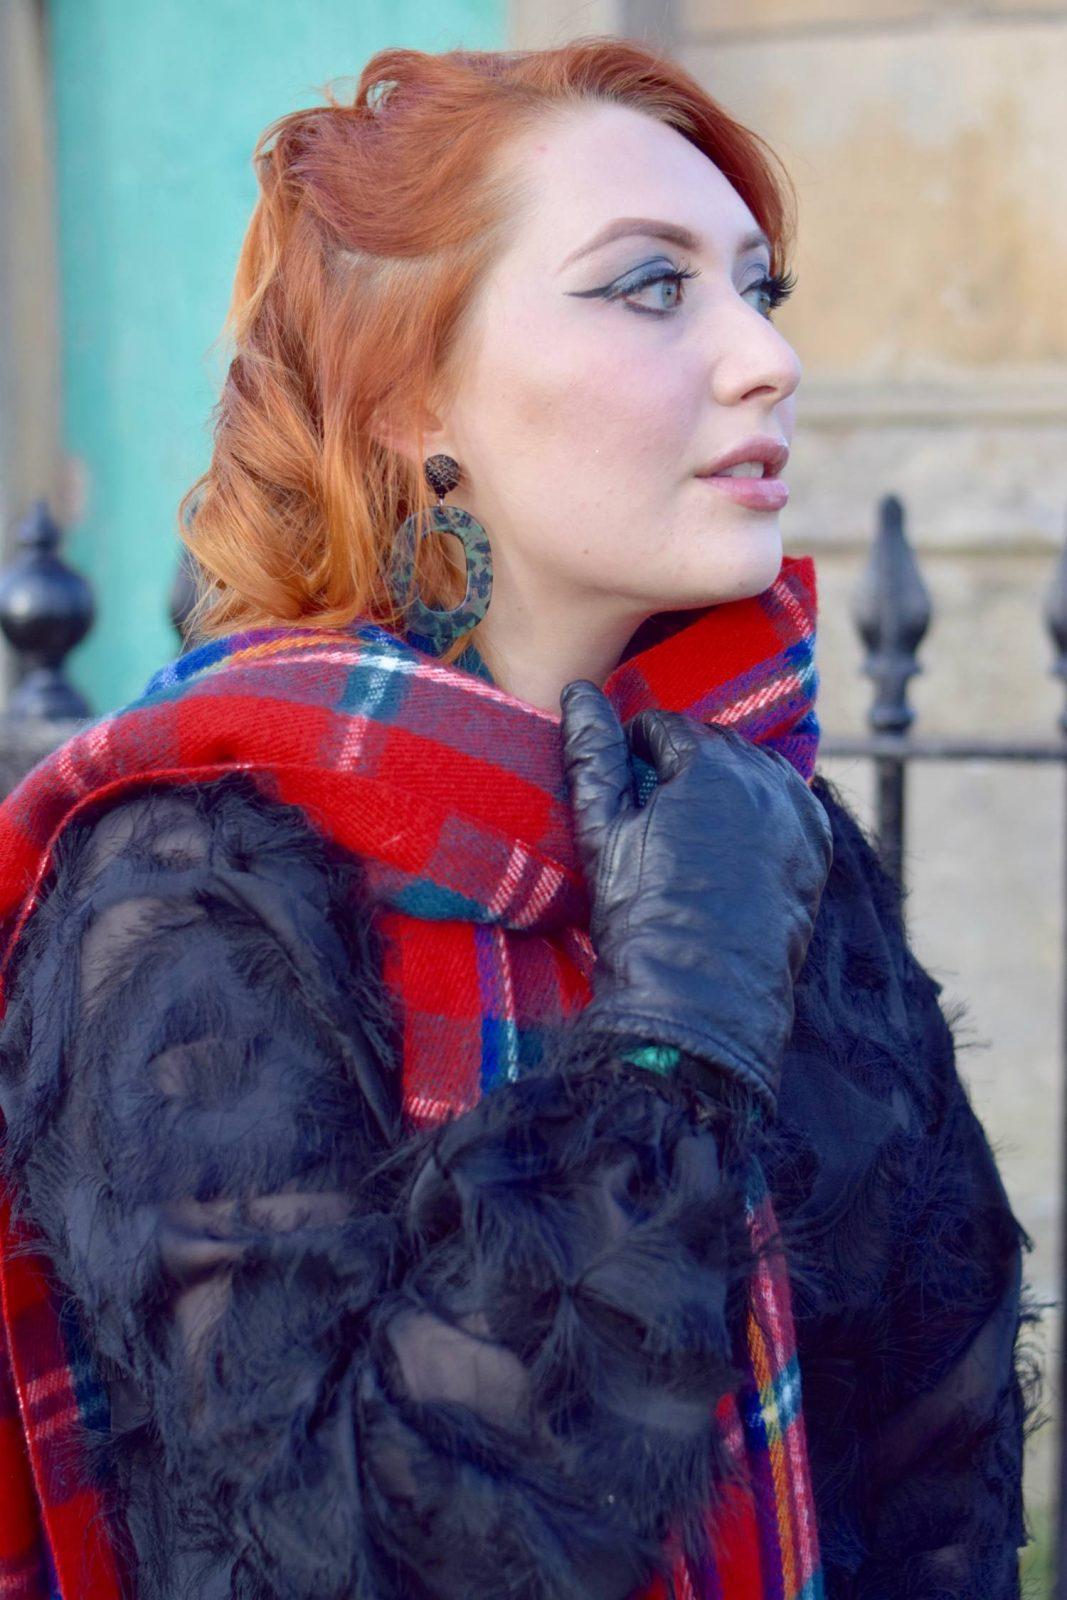 Twenty-Something City cosy winter fashion wearing tartan blanket scarf and statement earrings